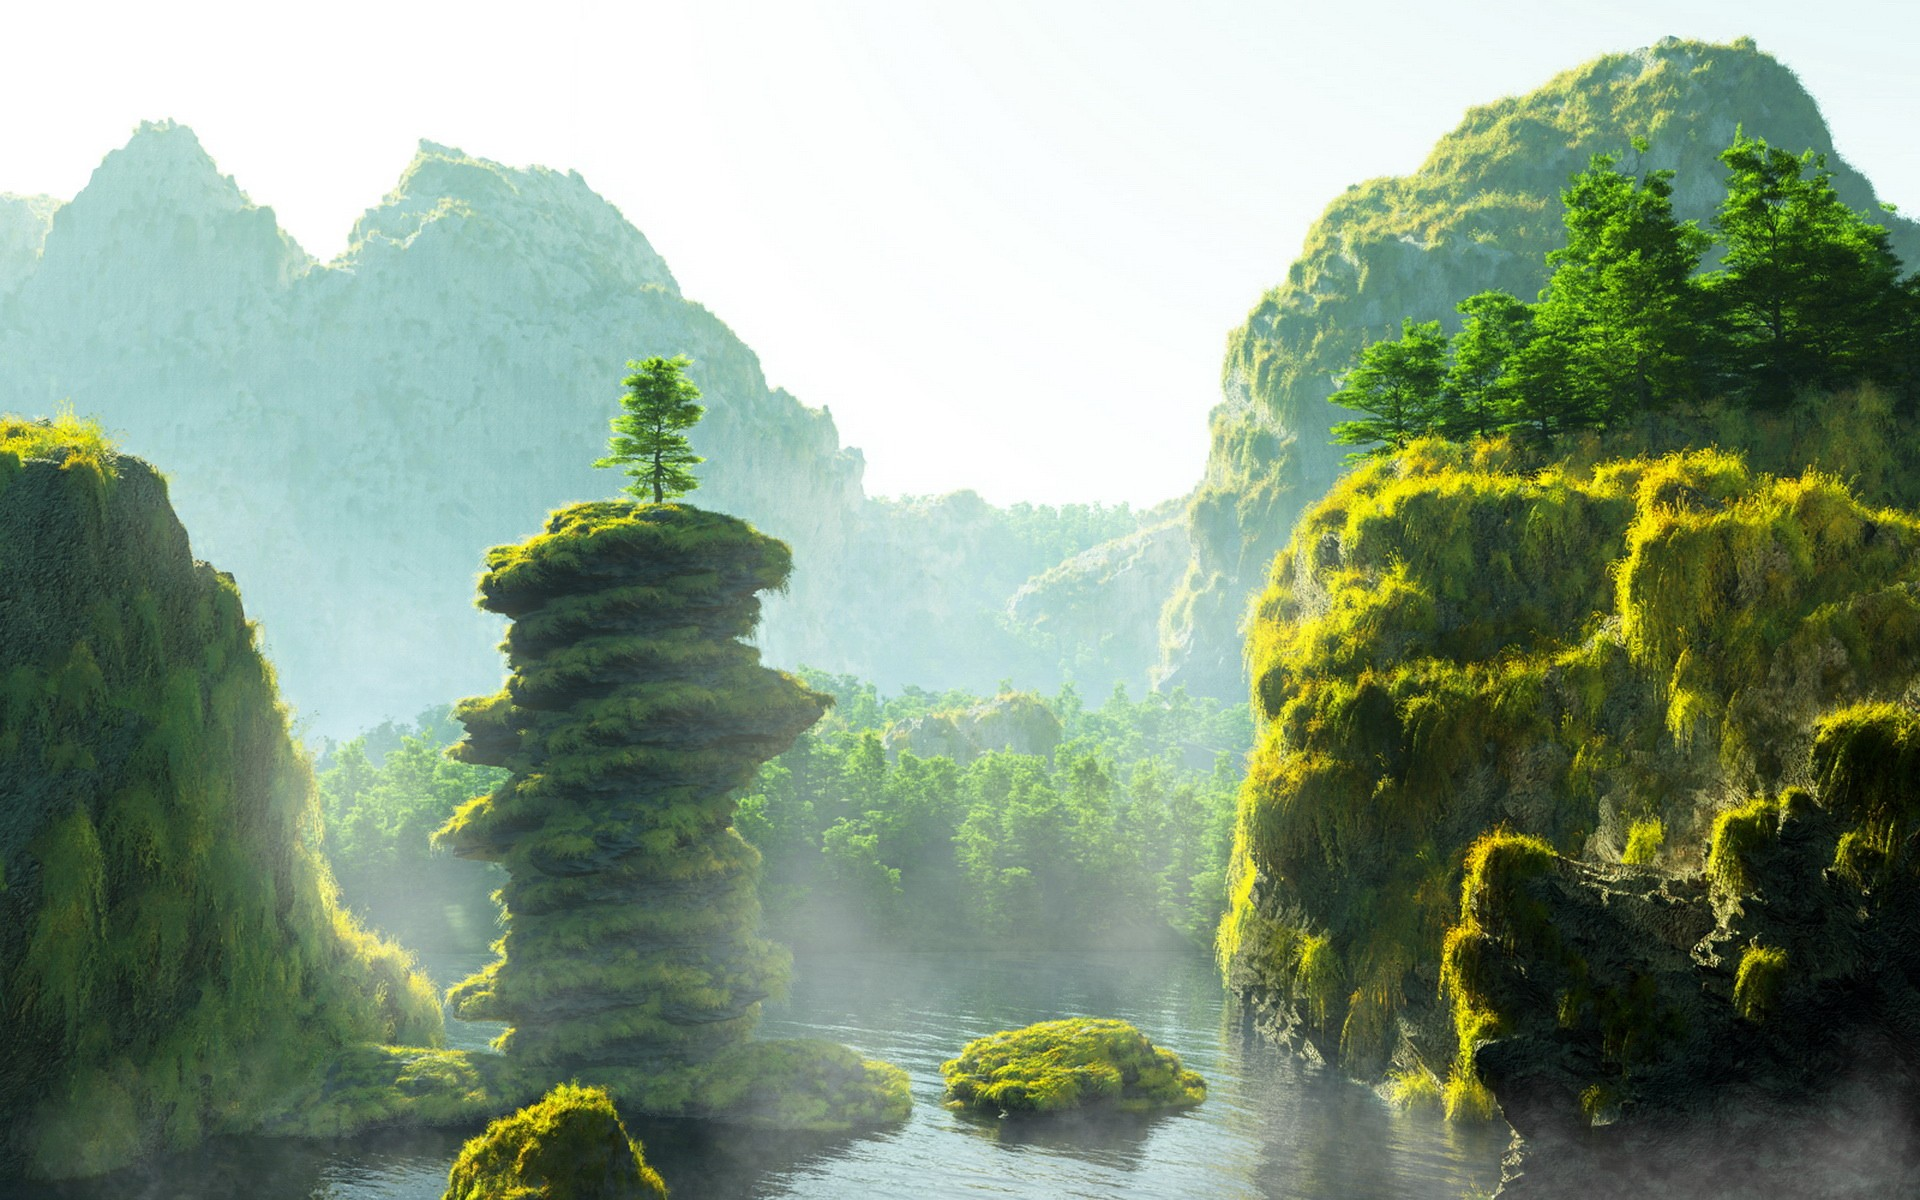 Hd Nature Wallpapers Amazing Landscape Images Green: Http://blood-lucario.deviantart.com/favourites/?offset=24